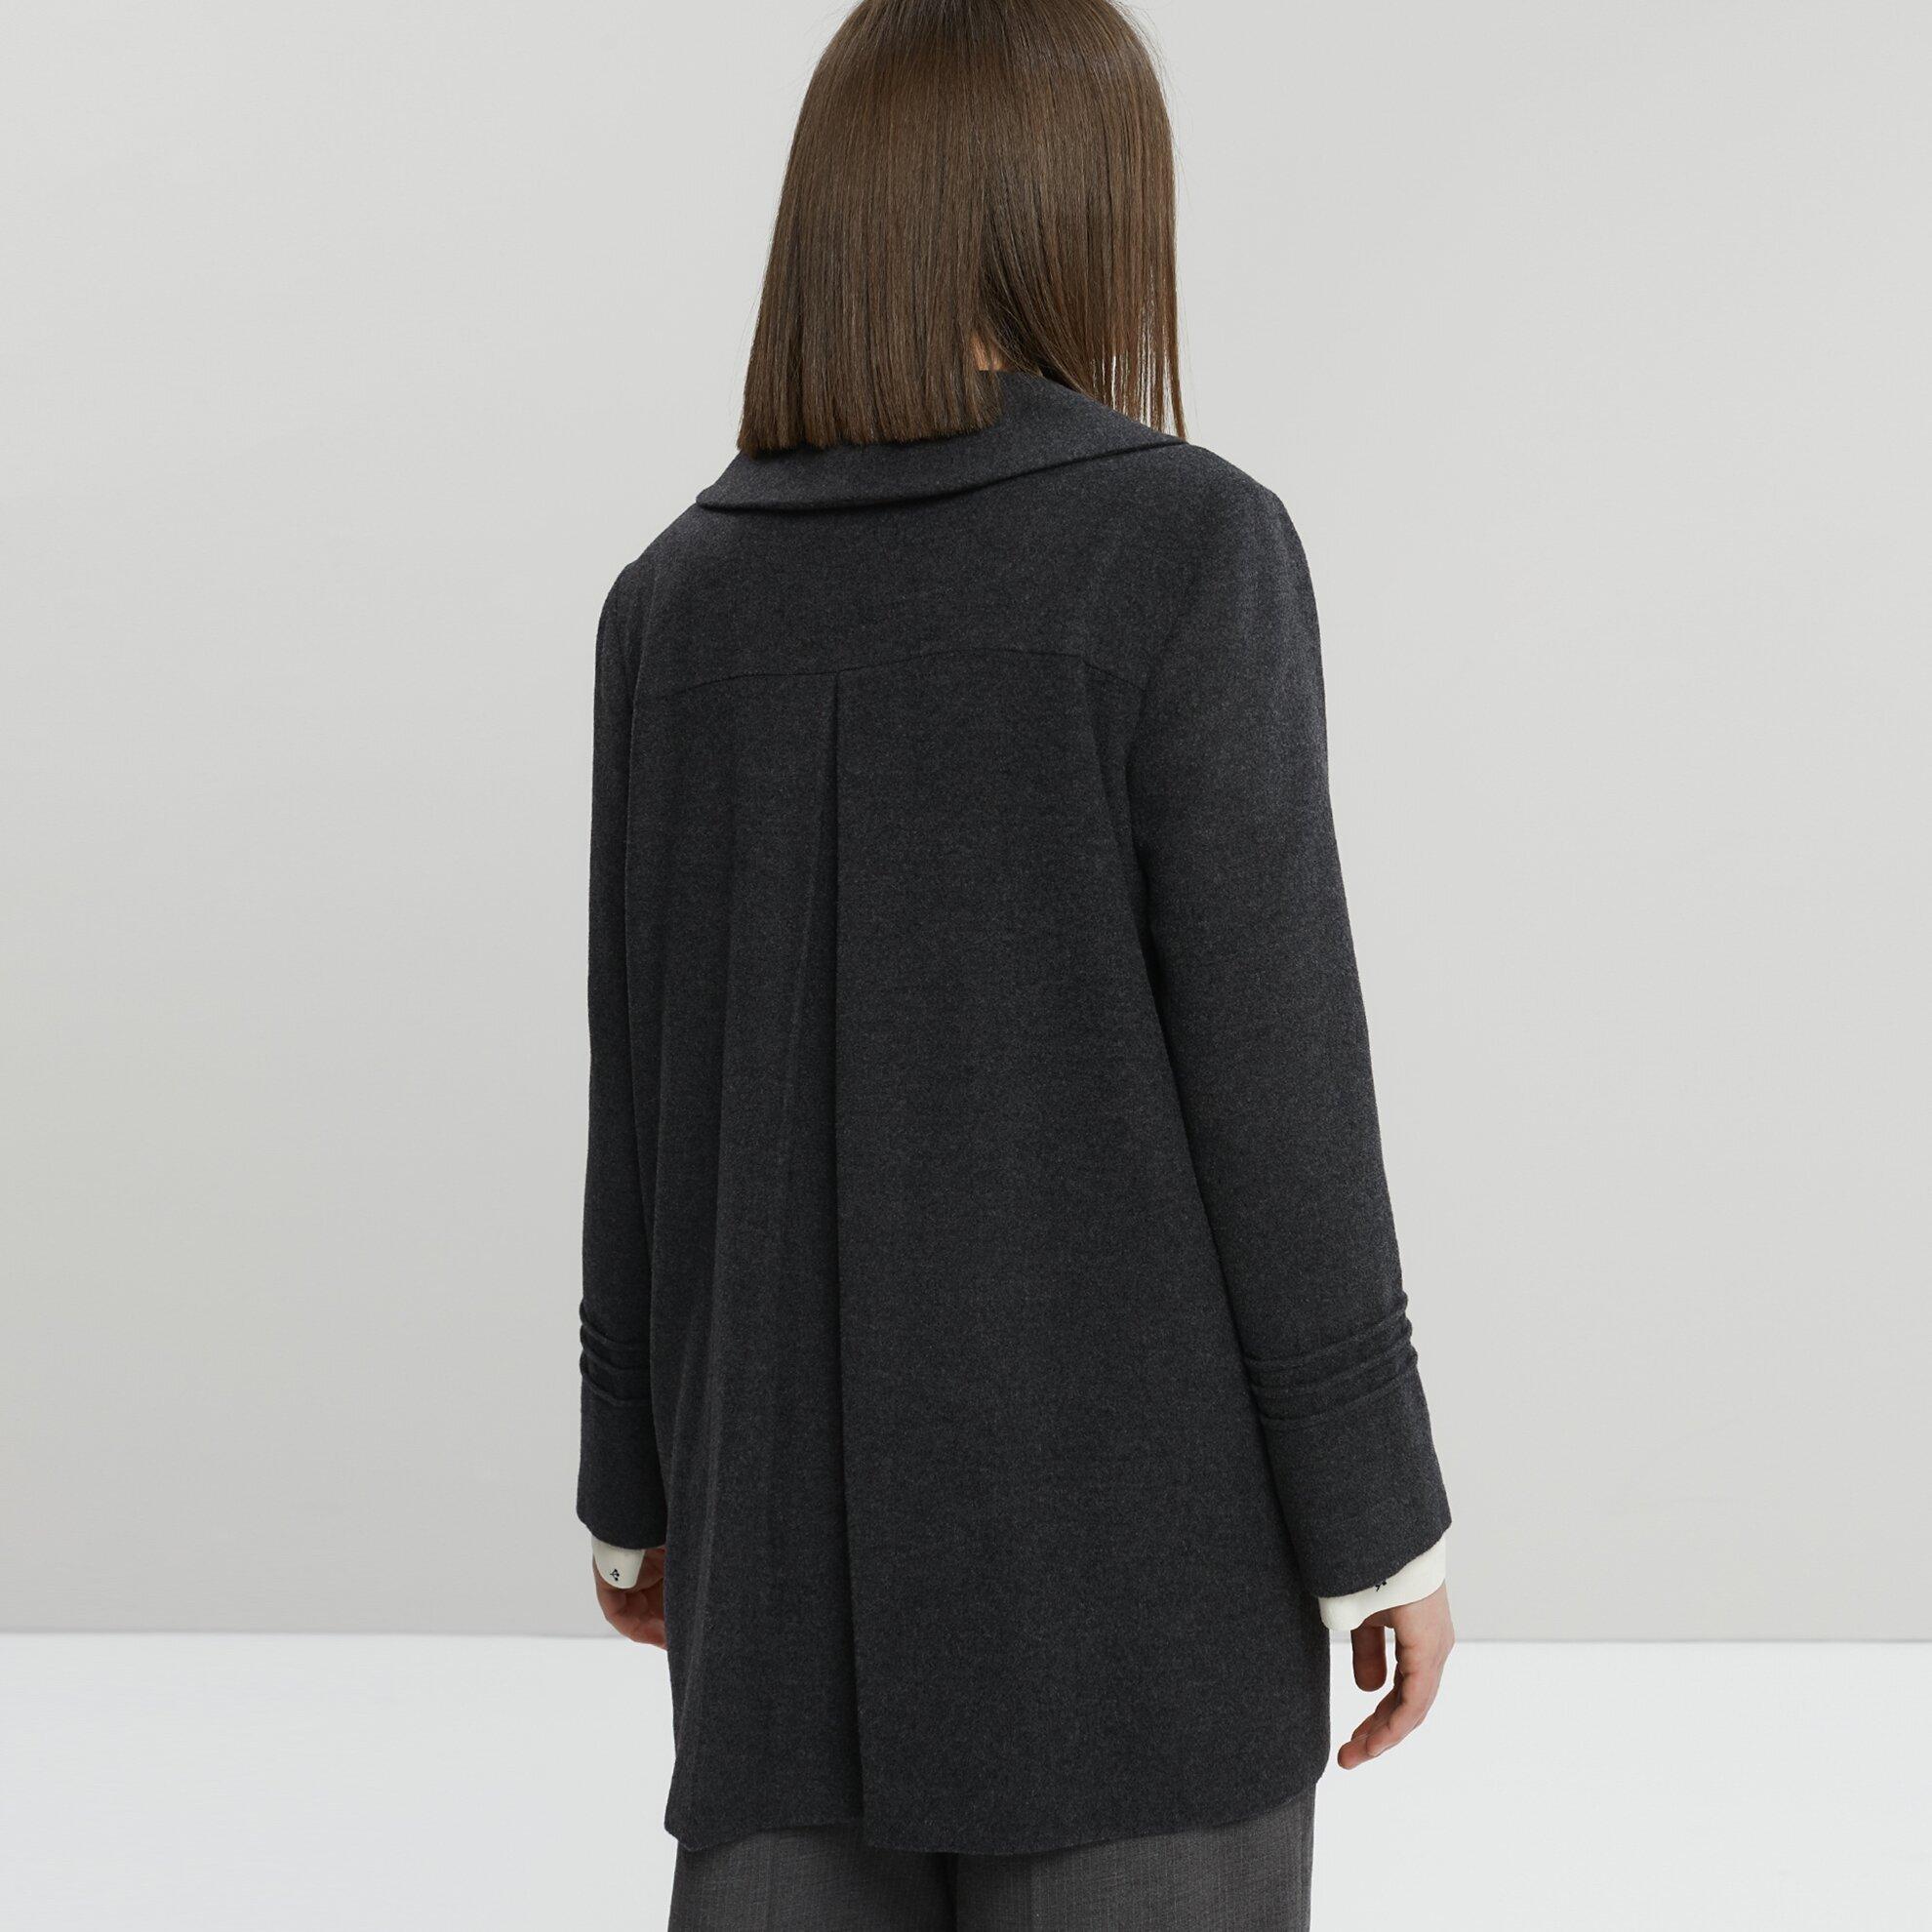 Nervür Detaylı Kısa Palto